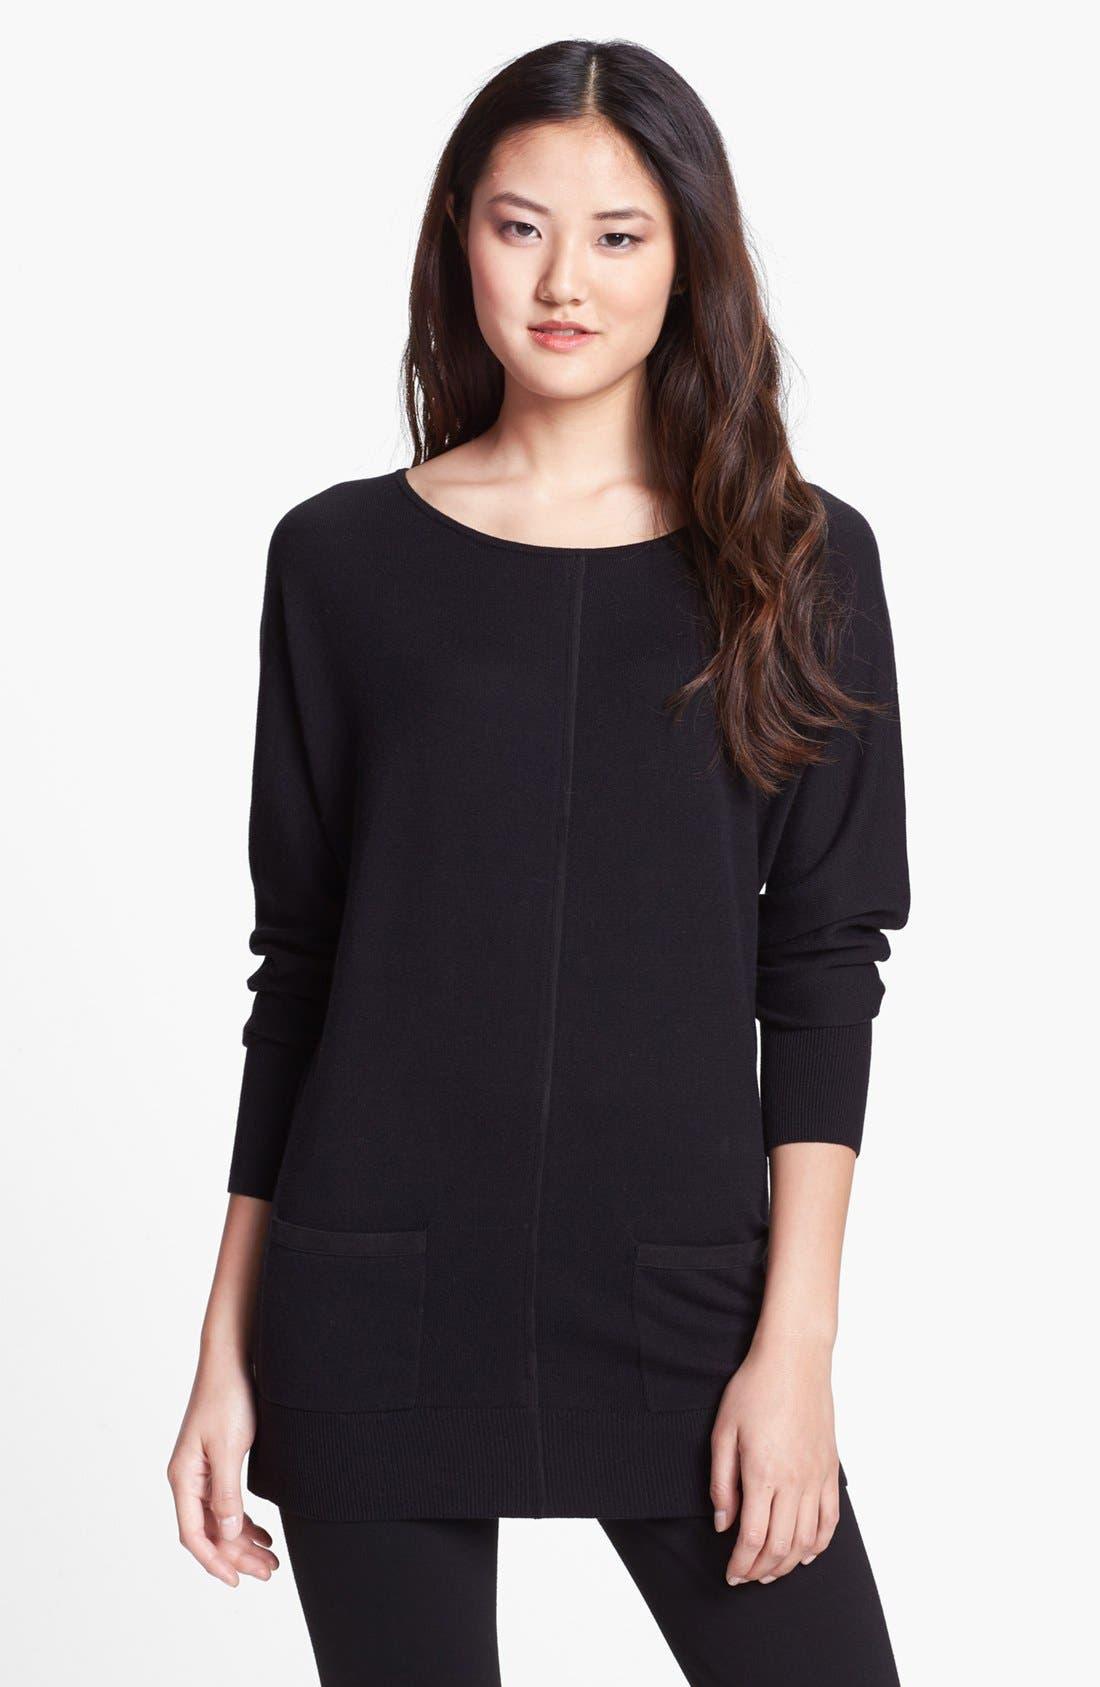 Alternate Image 1 Selected - Halogen® Dolman Sleeve Tunic Sweater (Regular & Petite)